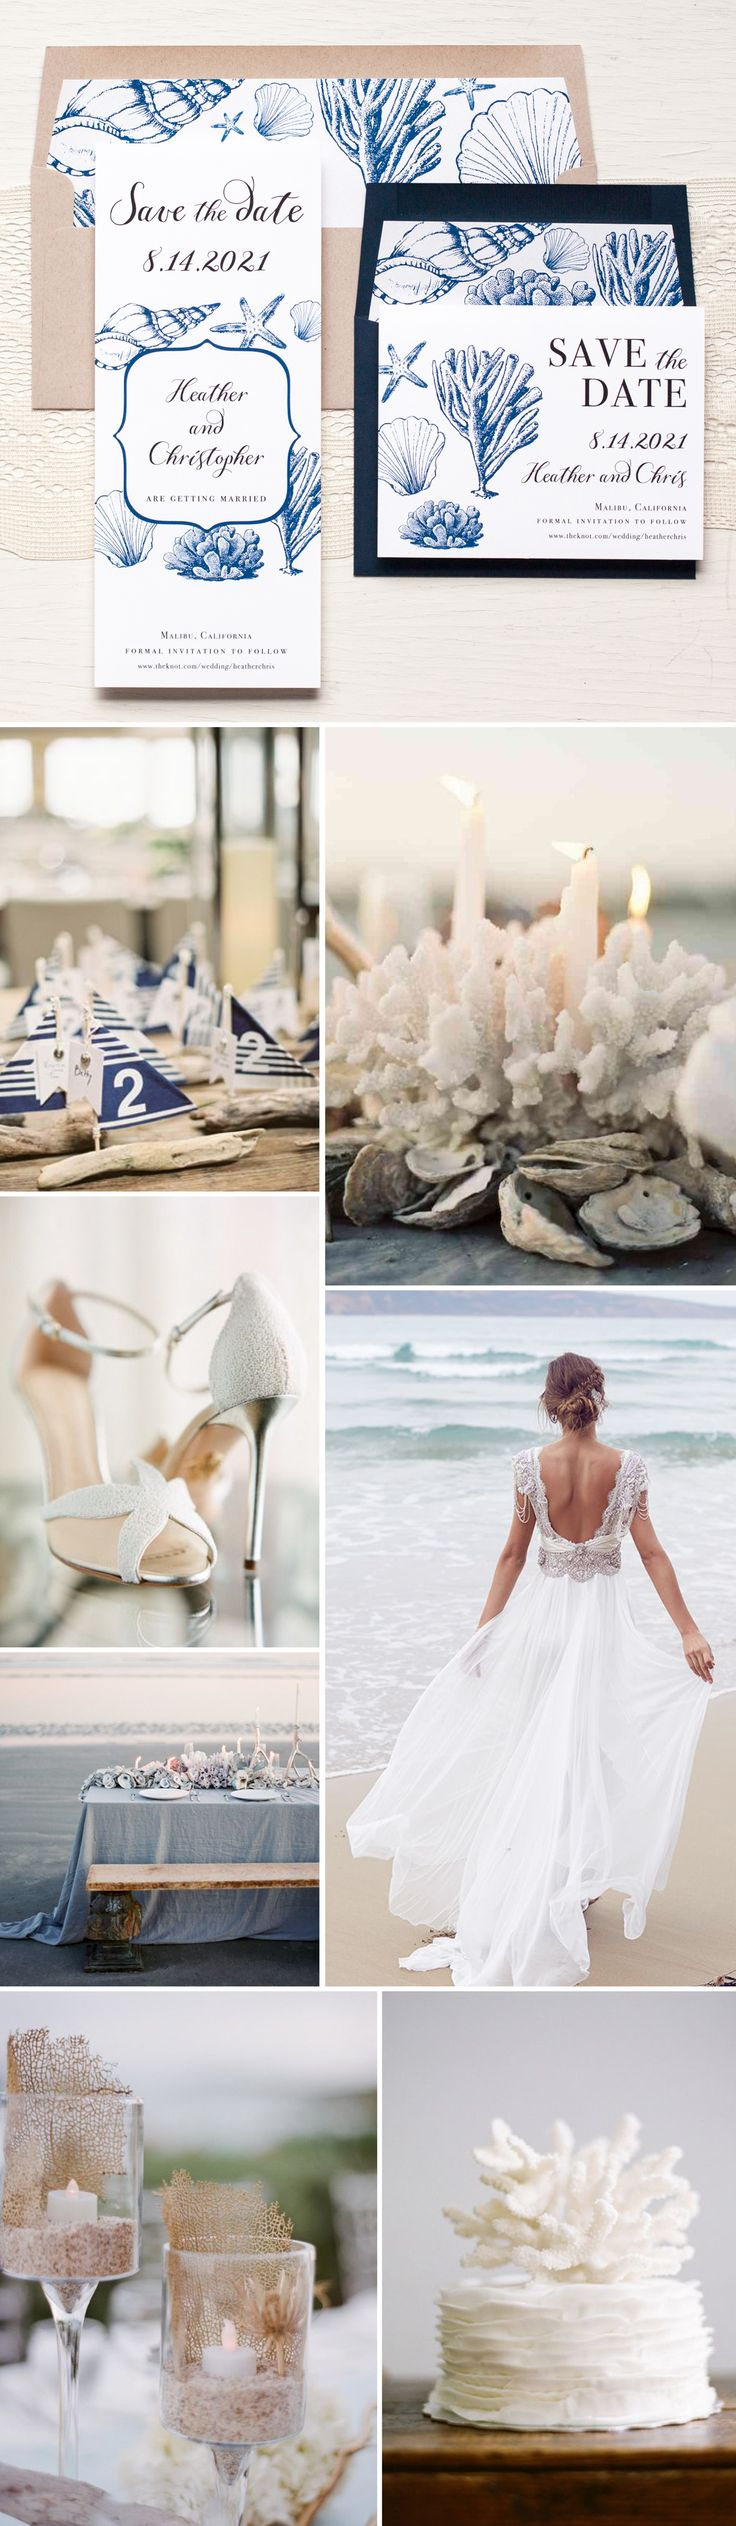 126 best Beach Wedding images on Pinterest | Beach weddings ...